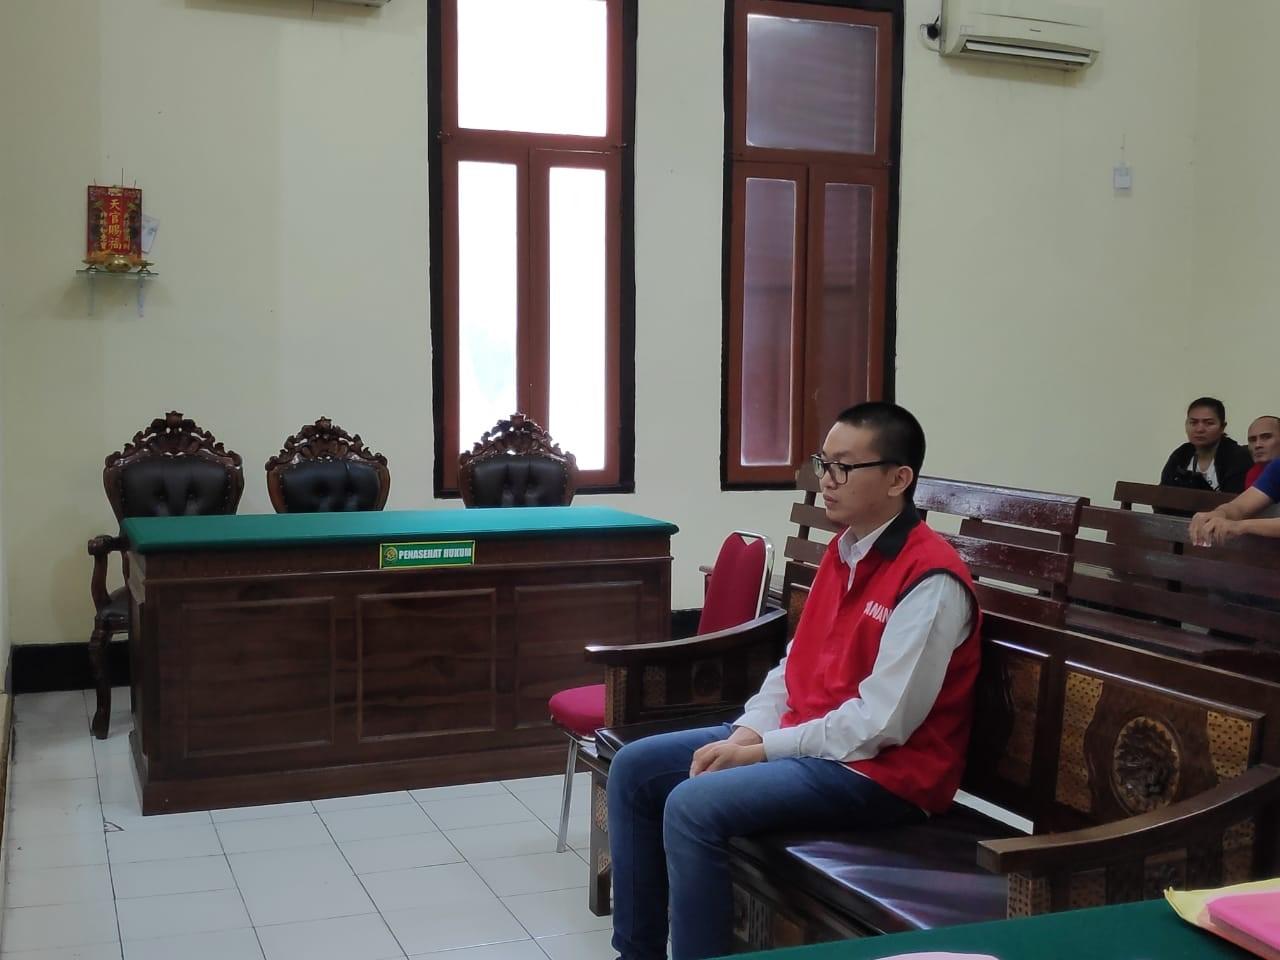 Warga Kramat Gantung Surabaya Edarkan Pil Ekstasi, Begini Dakwaannya